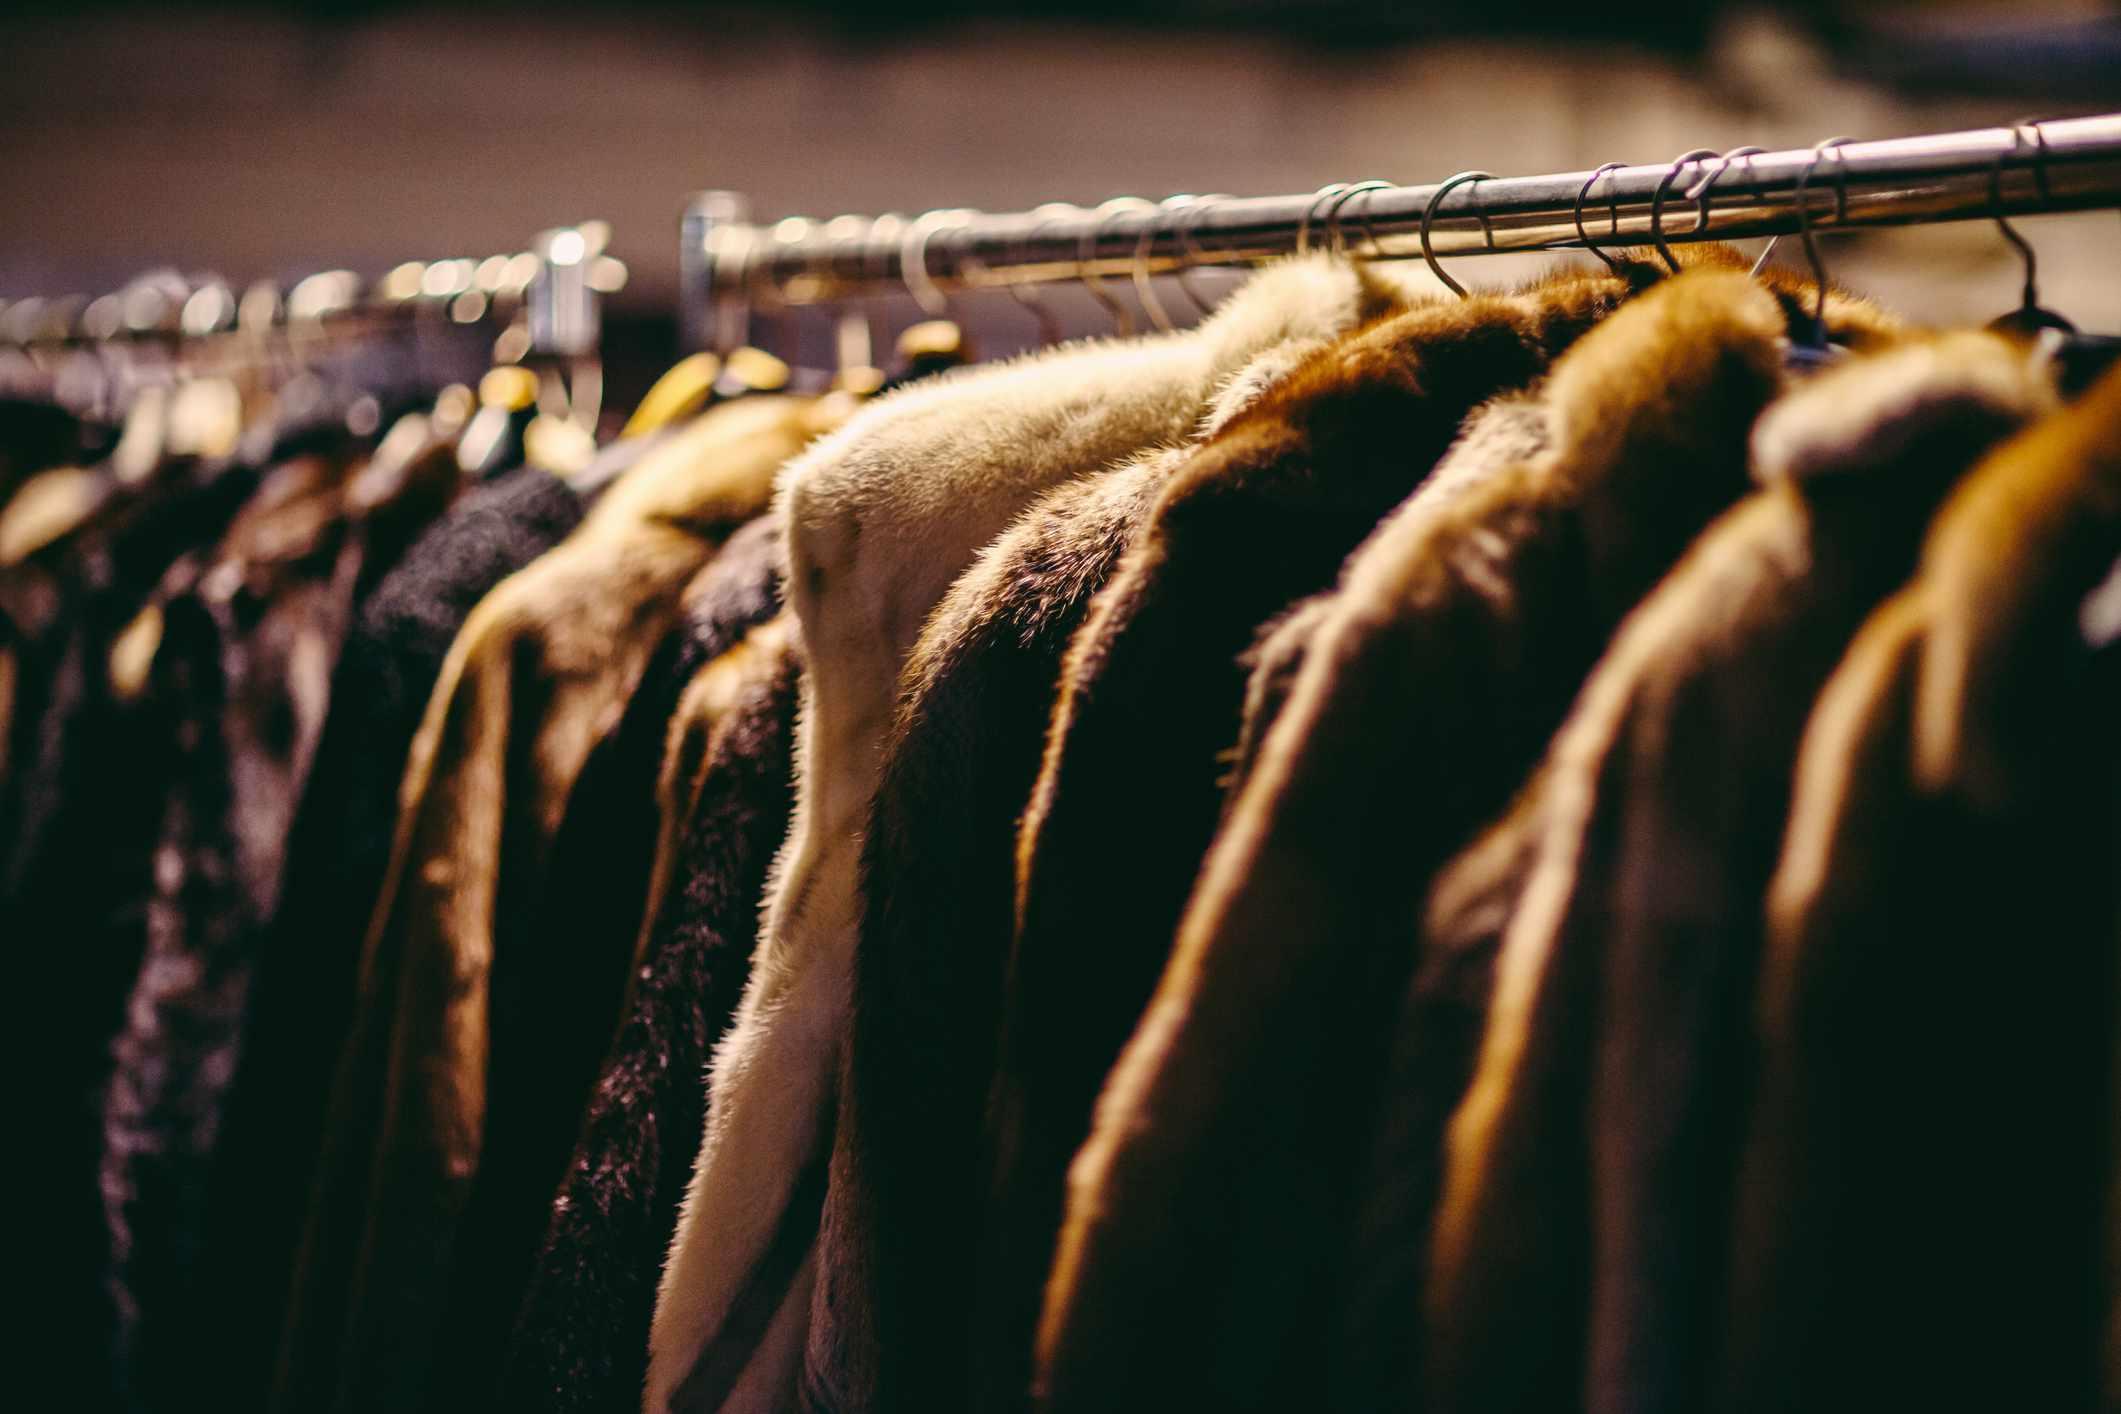 Hanging fur coats on a rack